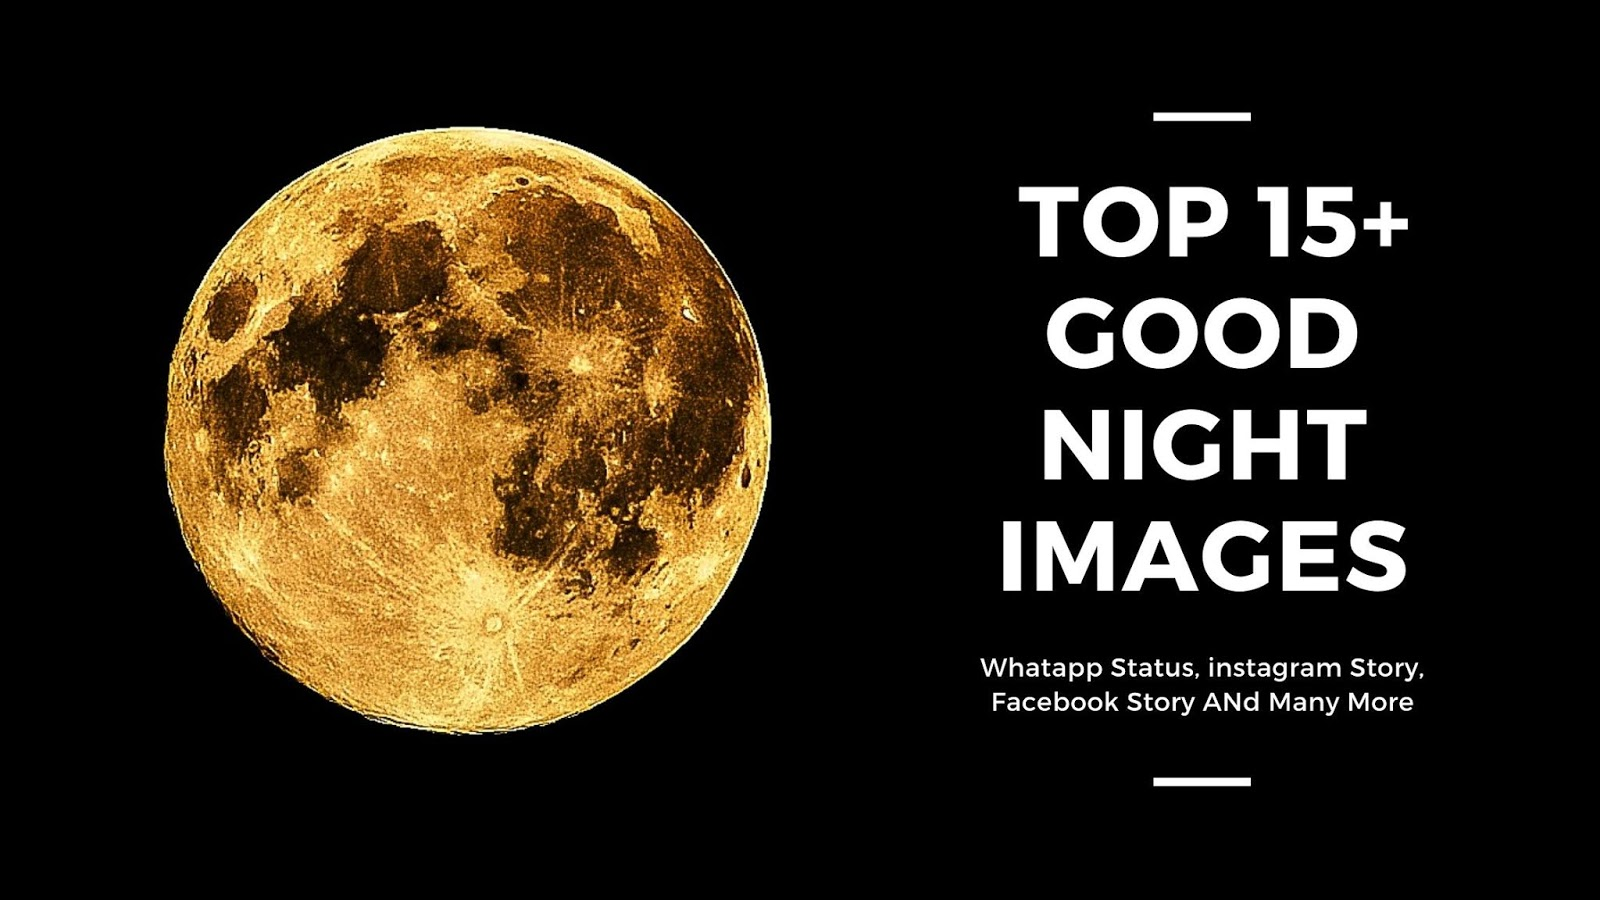 Best 15 Good Night Photo Full Moon 8th March 1600x900 Download Hd Wallpaper Wallpapertip